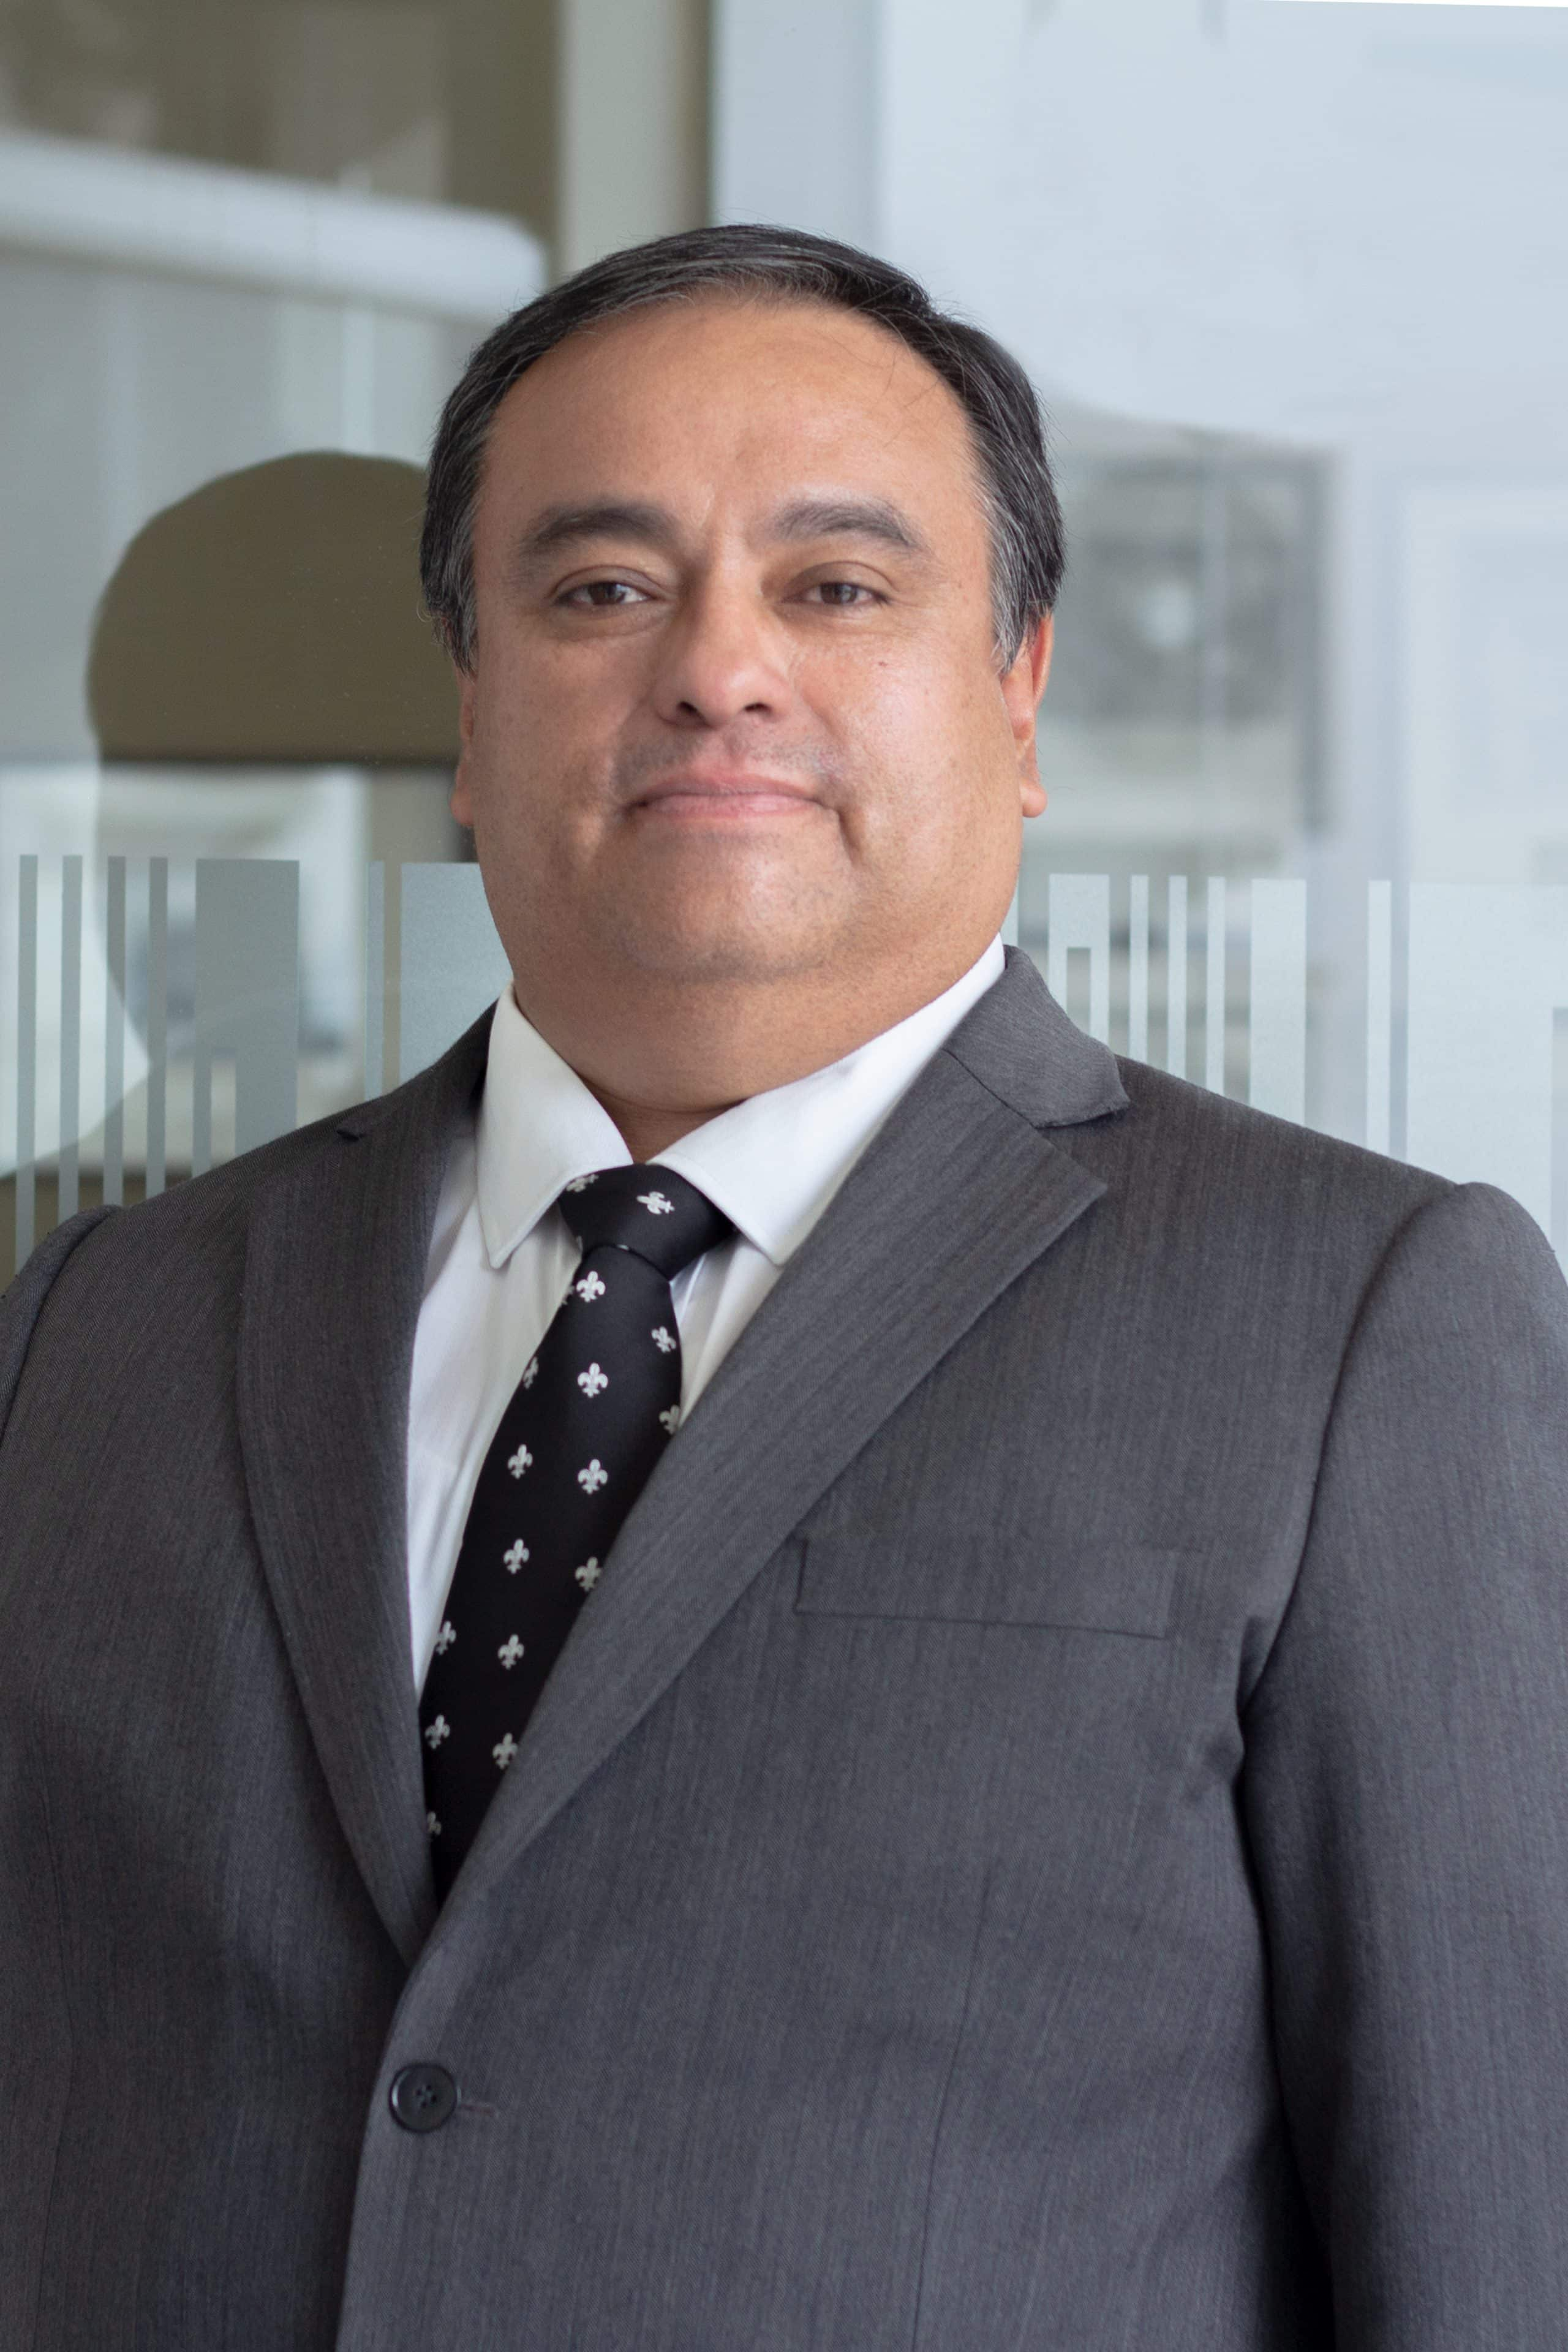 Luis Fernando Iberico Castañeda